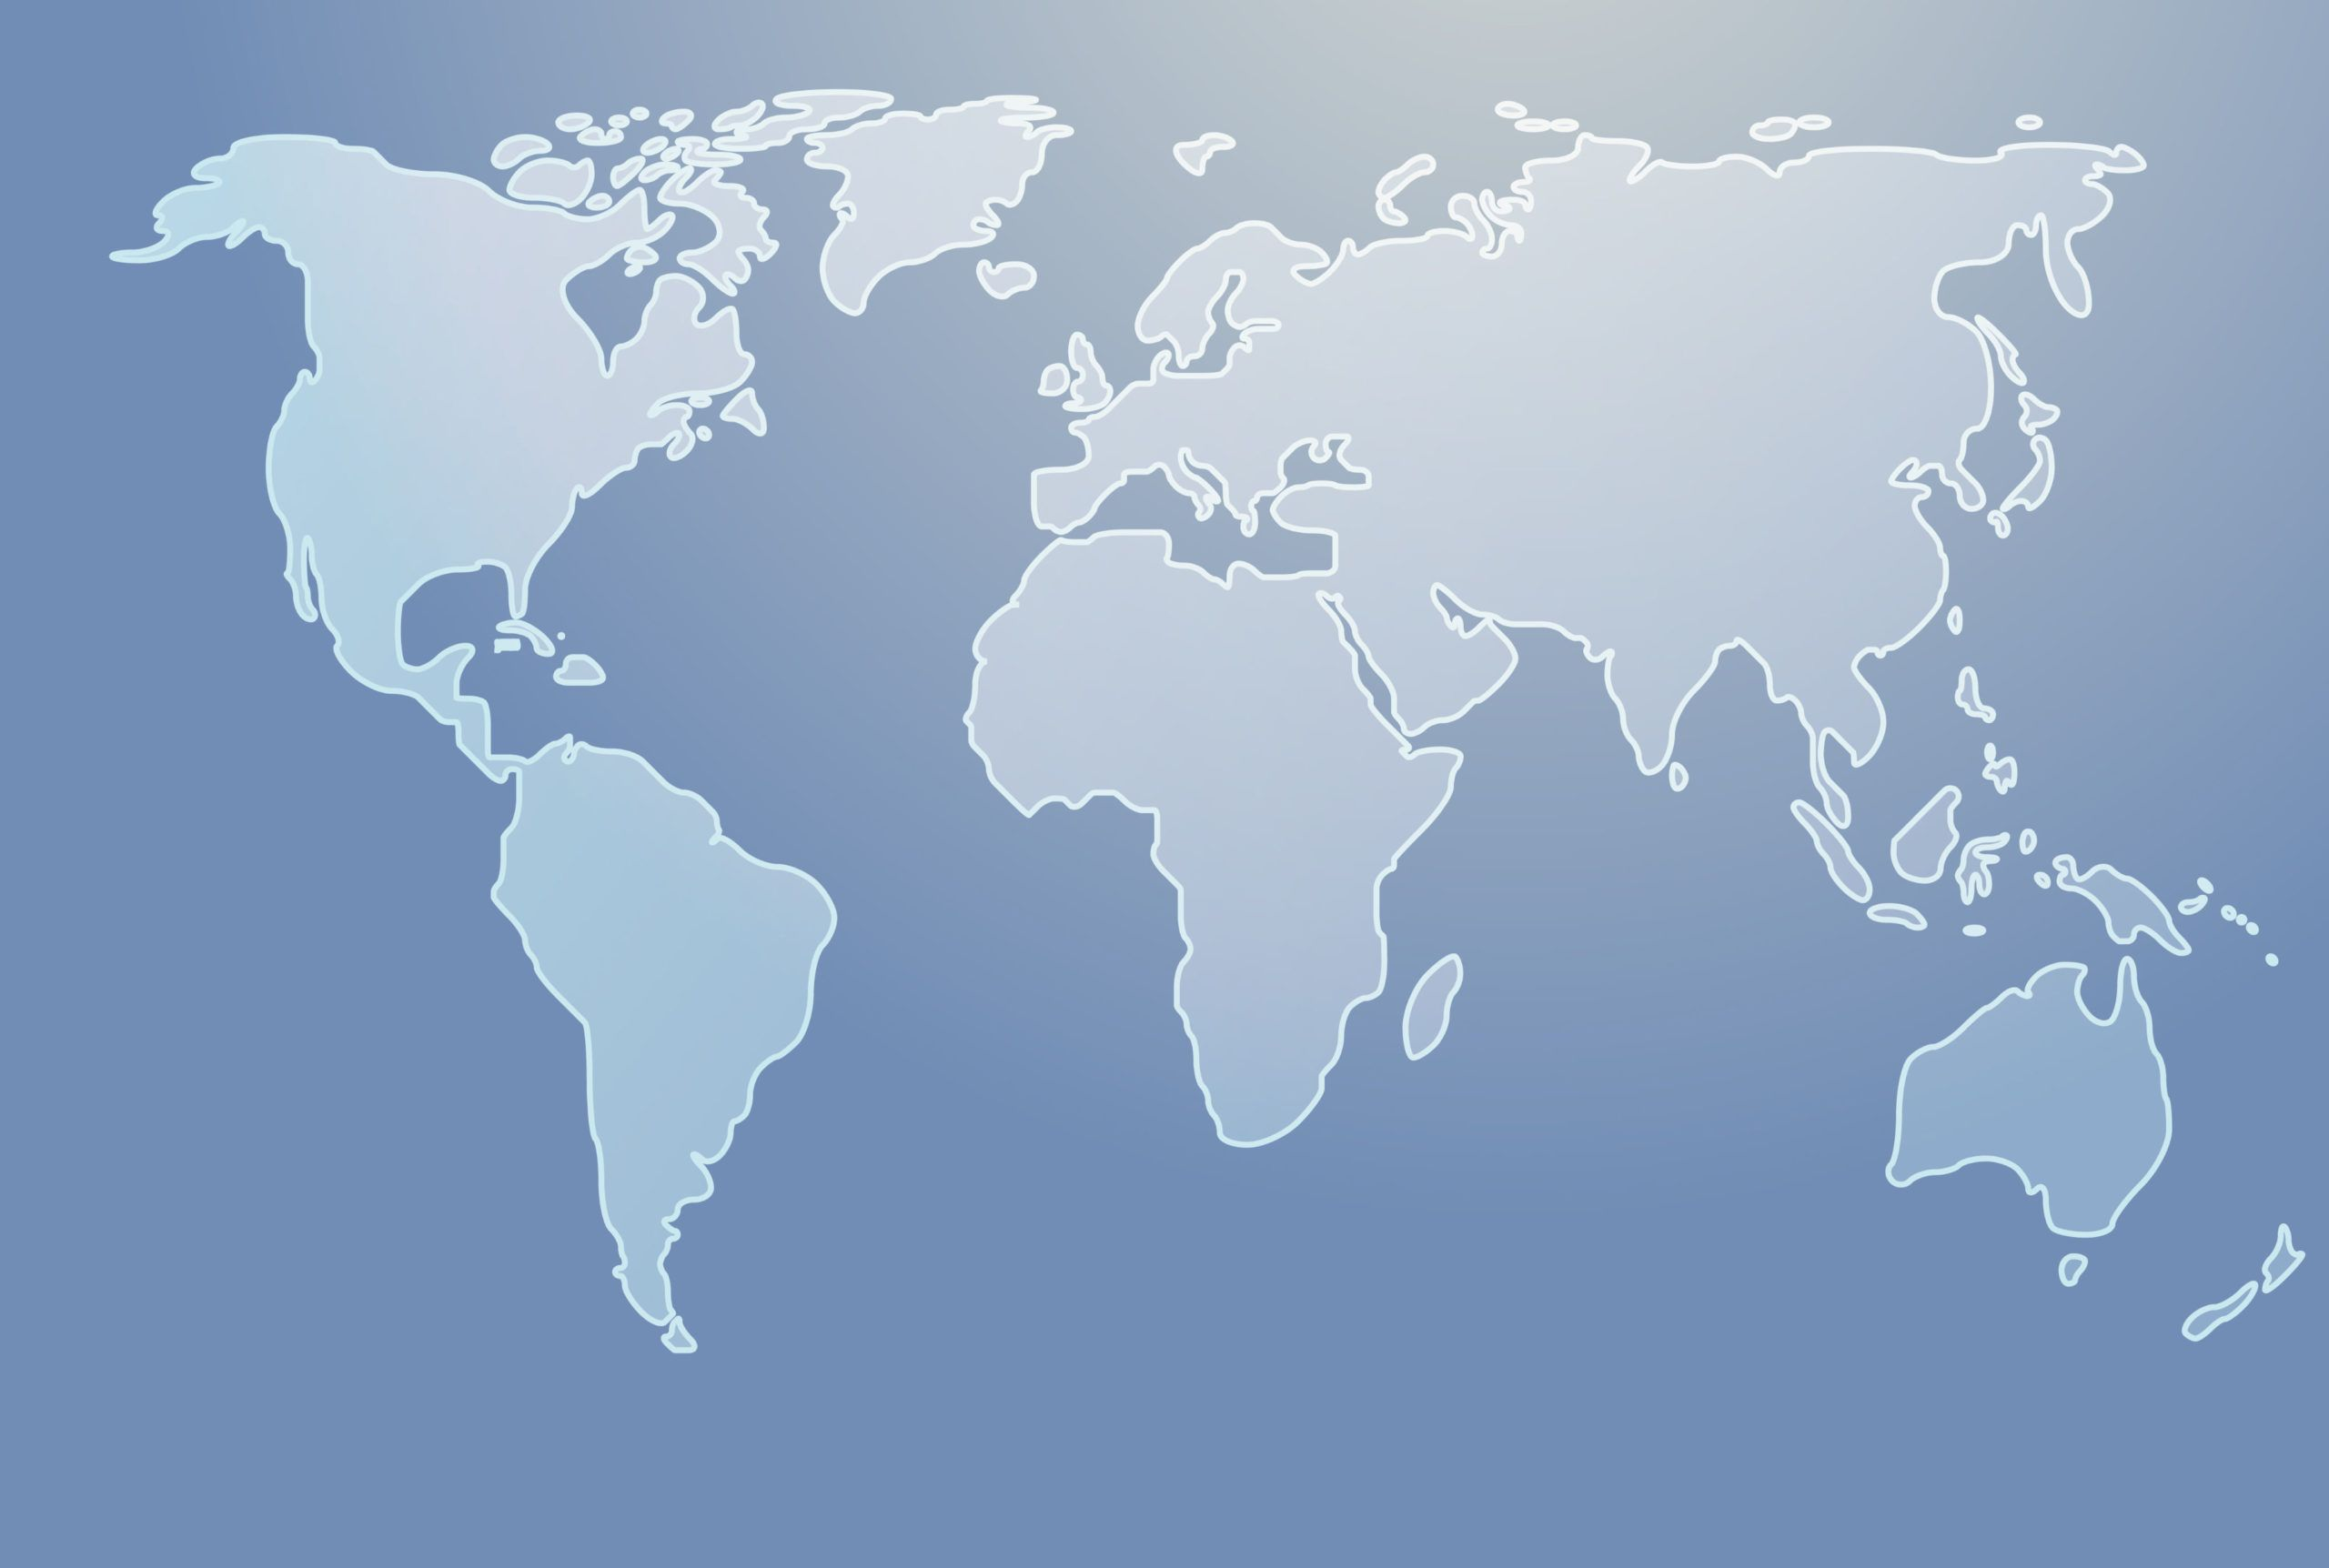 global marijuana expansion, Time is right for marijuana entrepreneurs to enter the global market